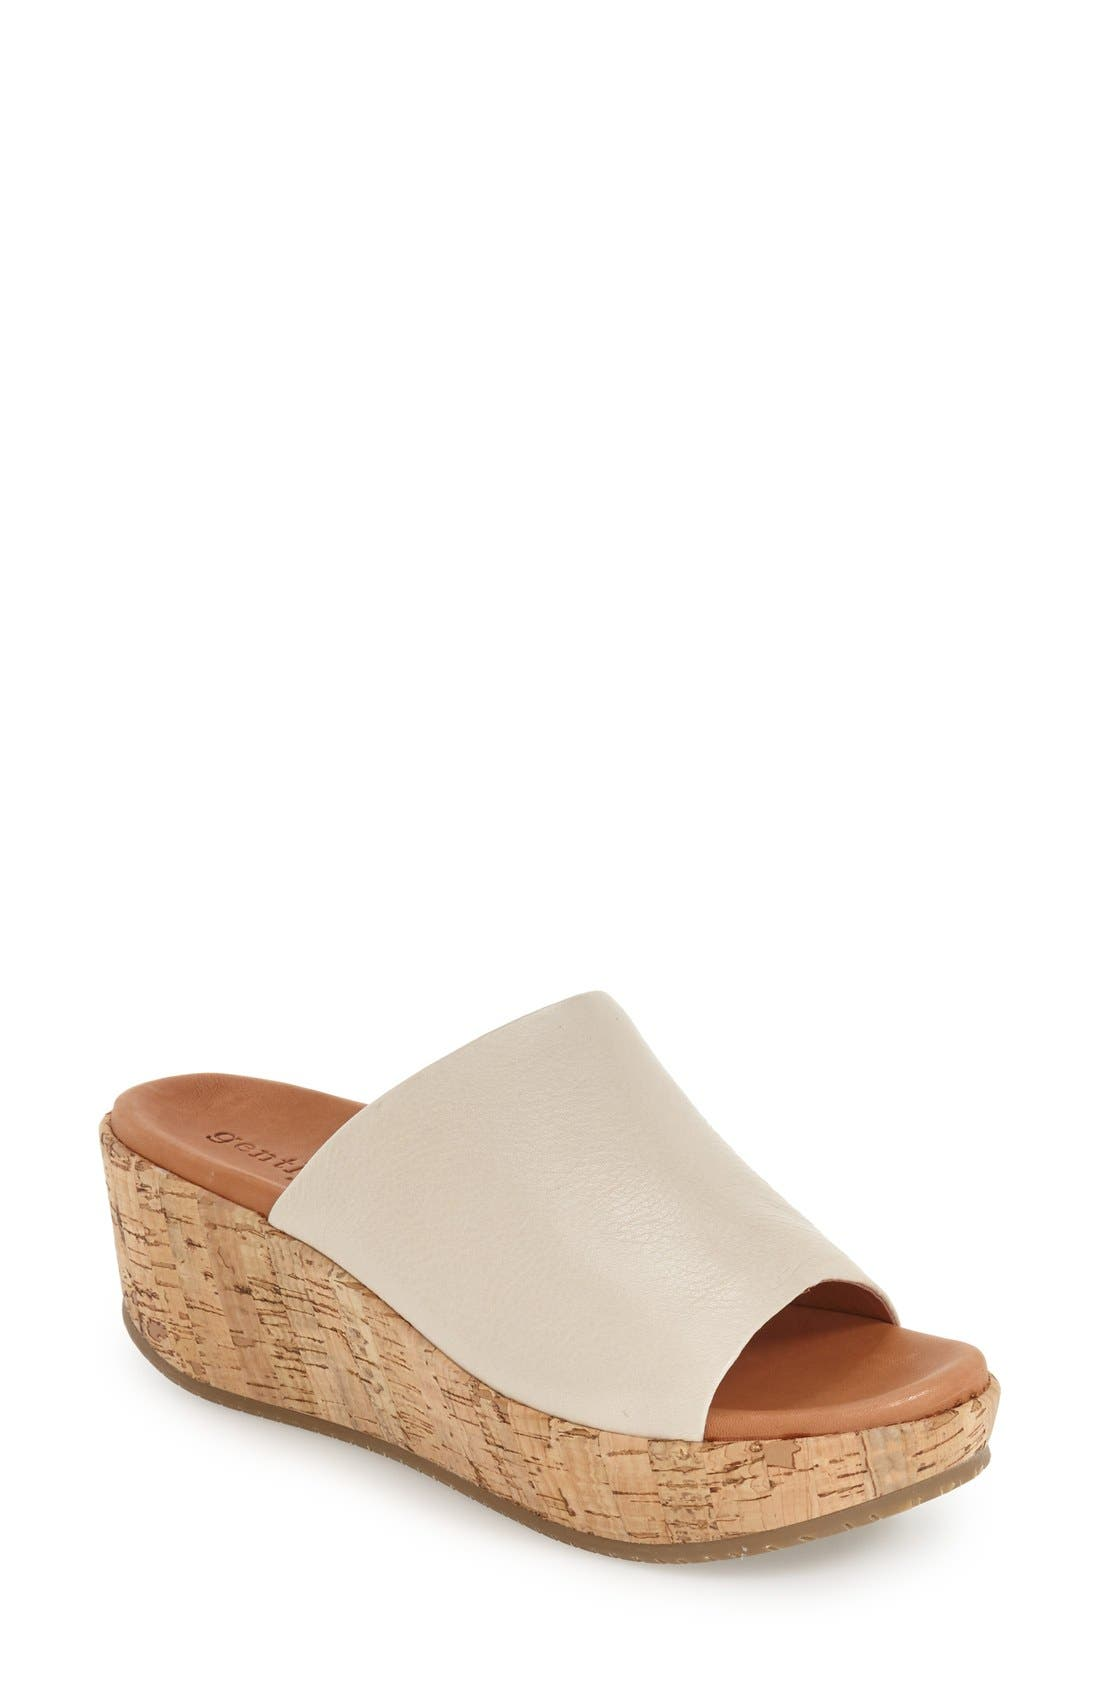 'Megan' Platform Wedge Sandal,                             Main thumbnail 1, color,                             053